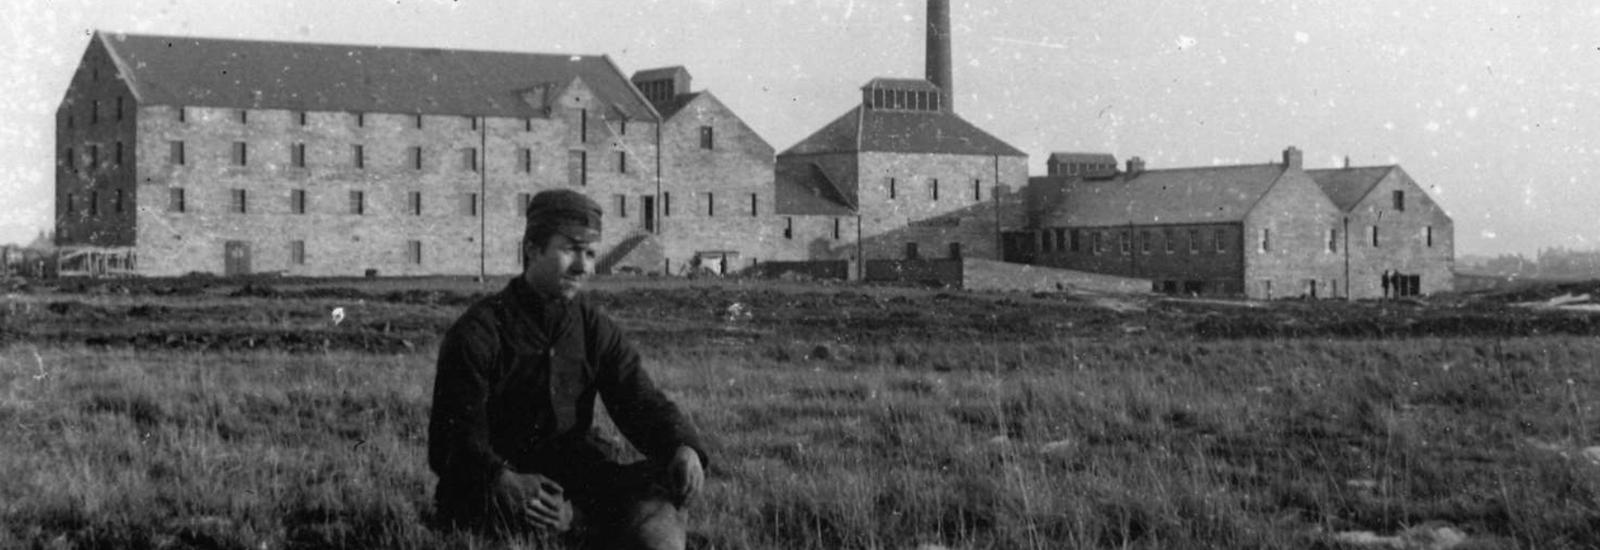 "Lost Distilleries ""Lost but not forgotten"""